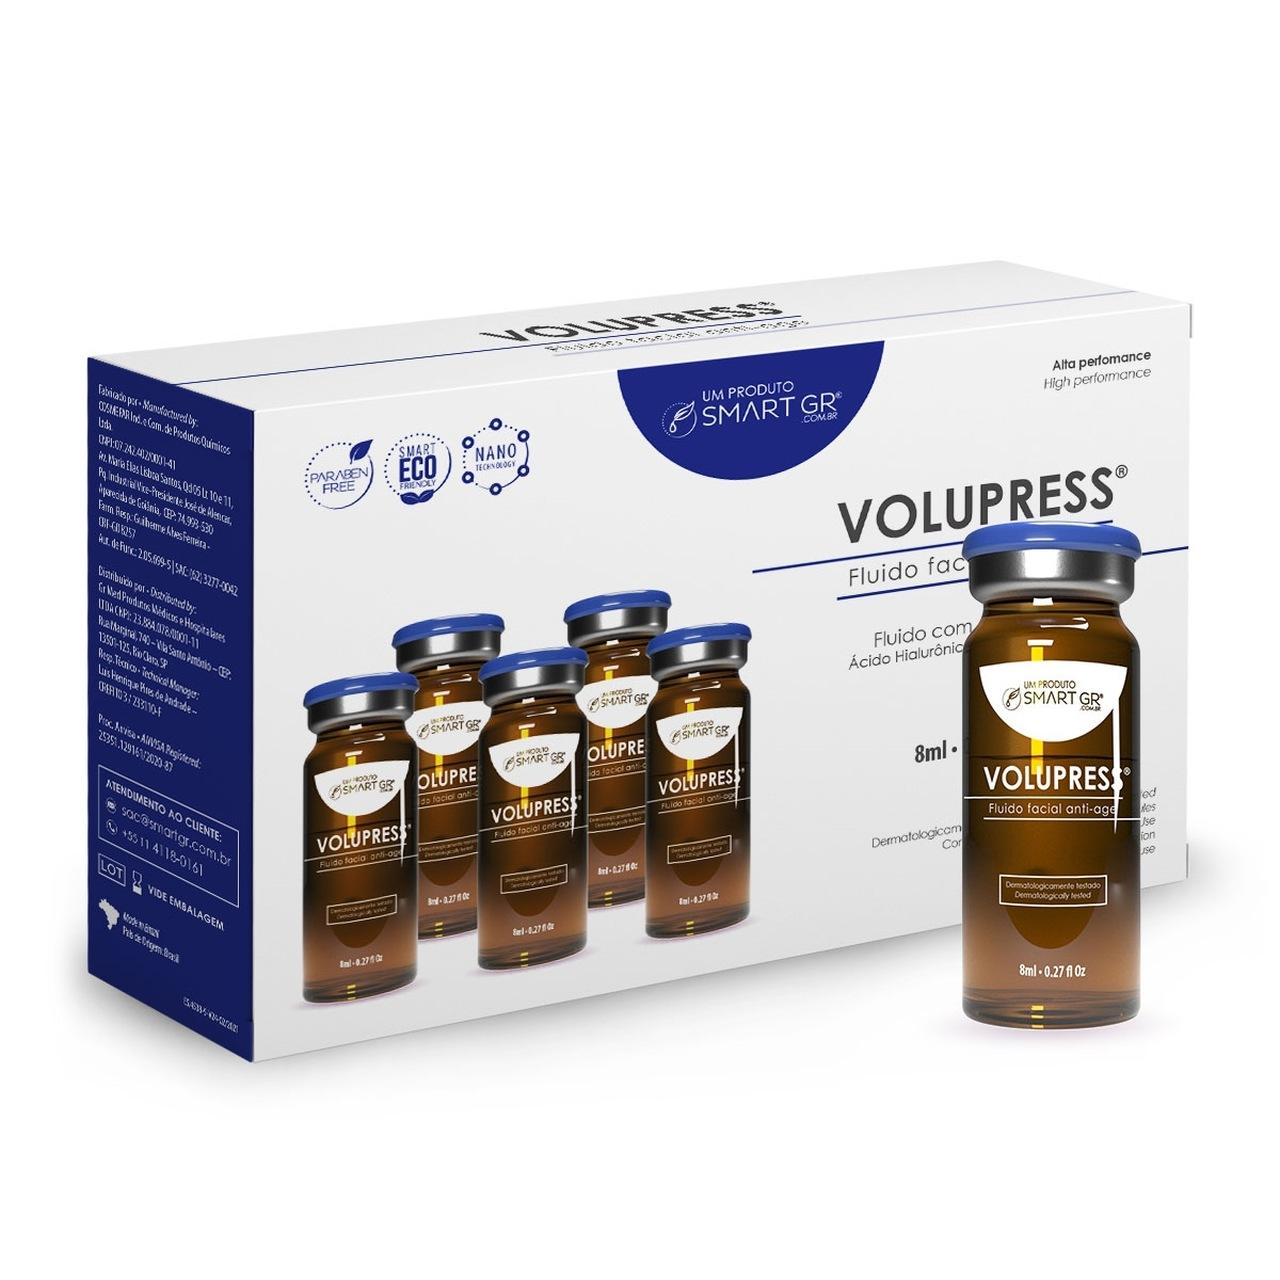 Kit Volupress 5 Ampolas - Fluido facial anti-age - Smart GR